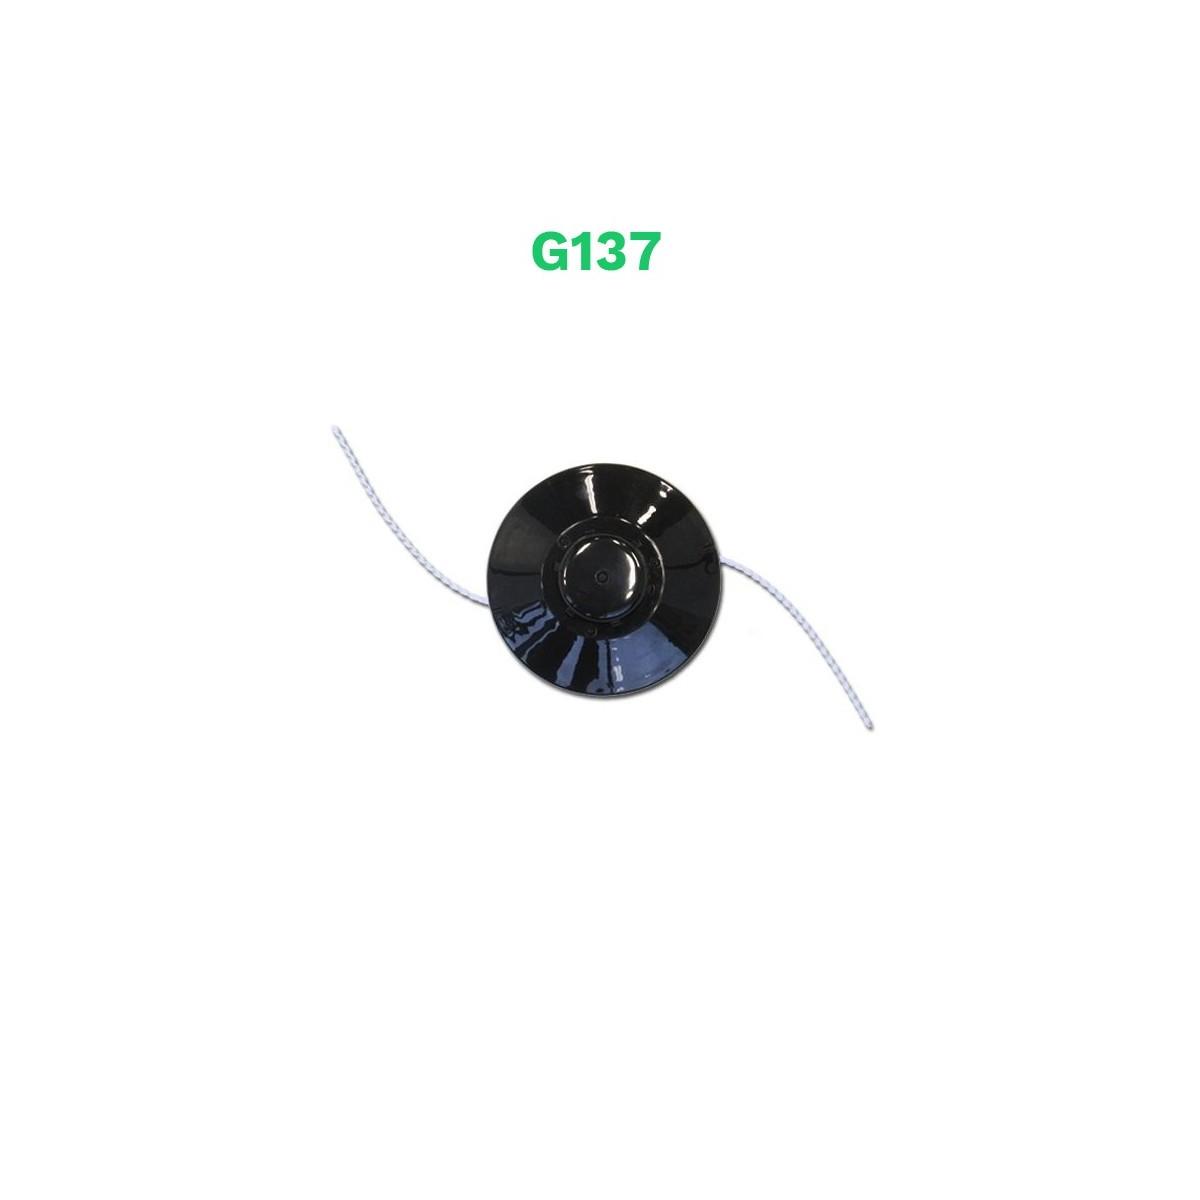 echo cabezal semiautomatico g137